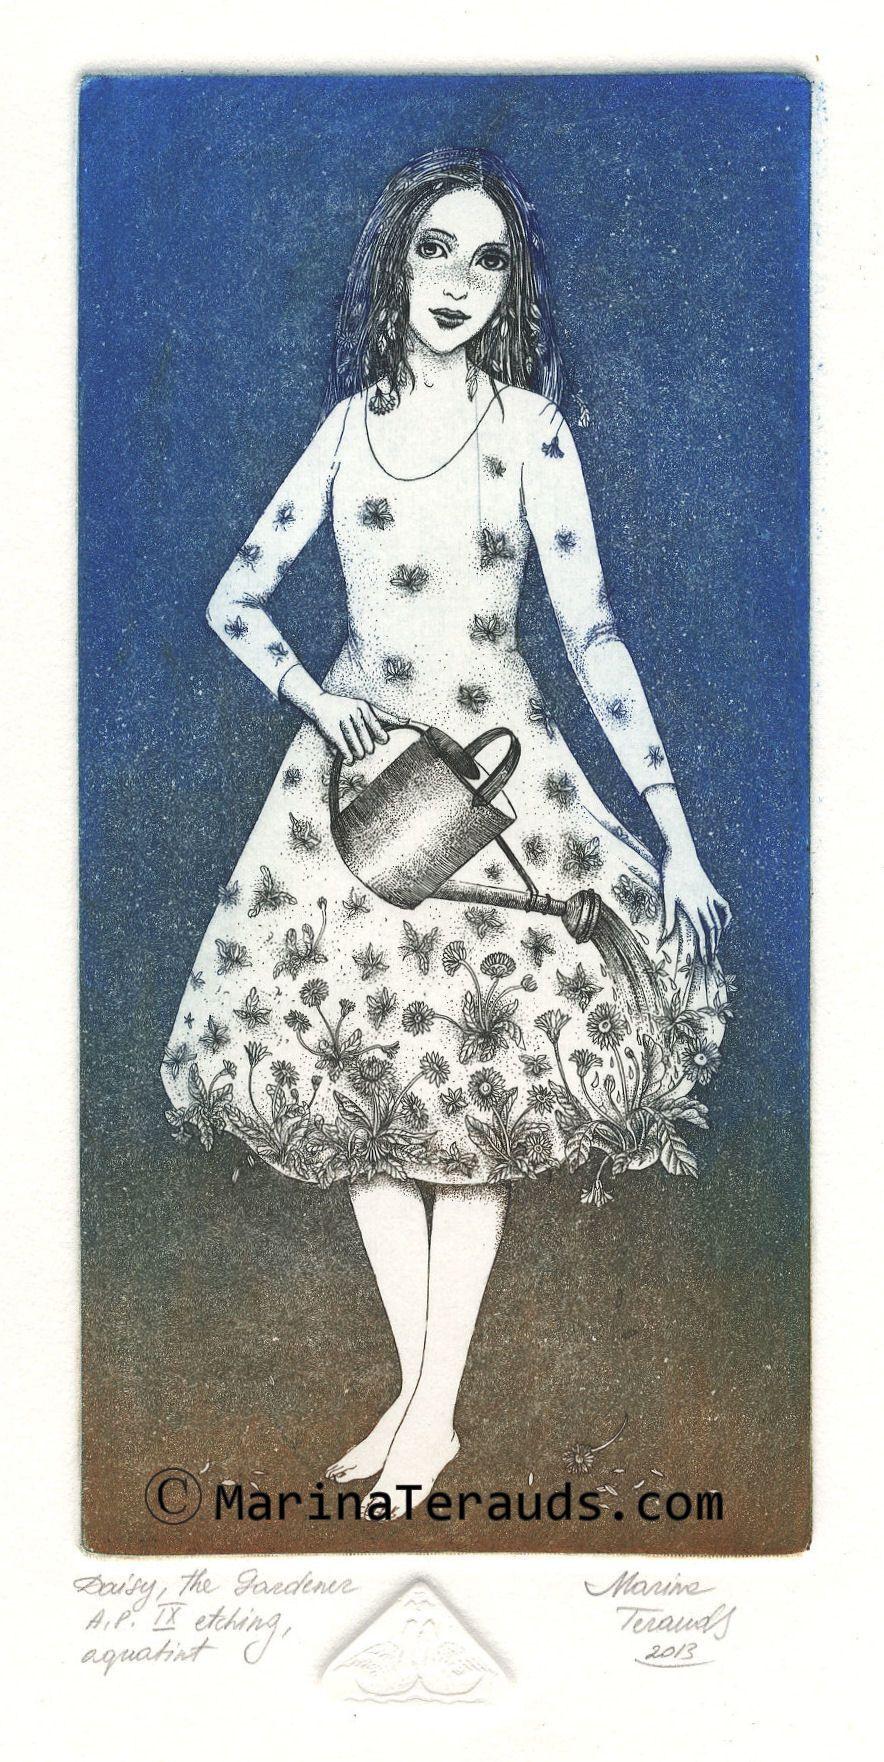 Daisy by Marina Terauds, etching, aquatint